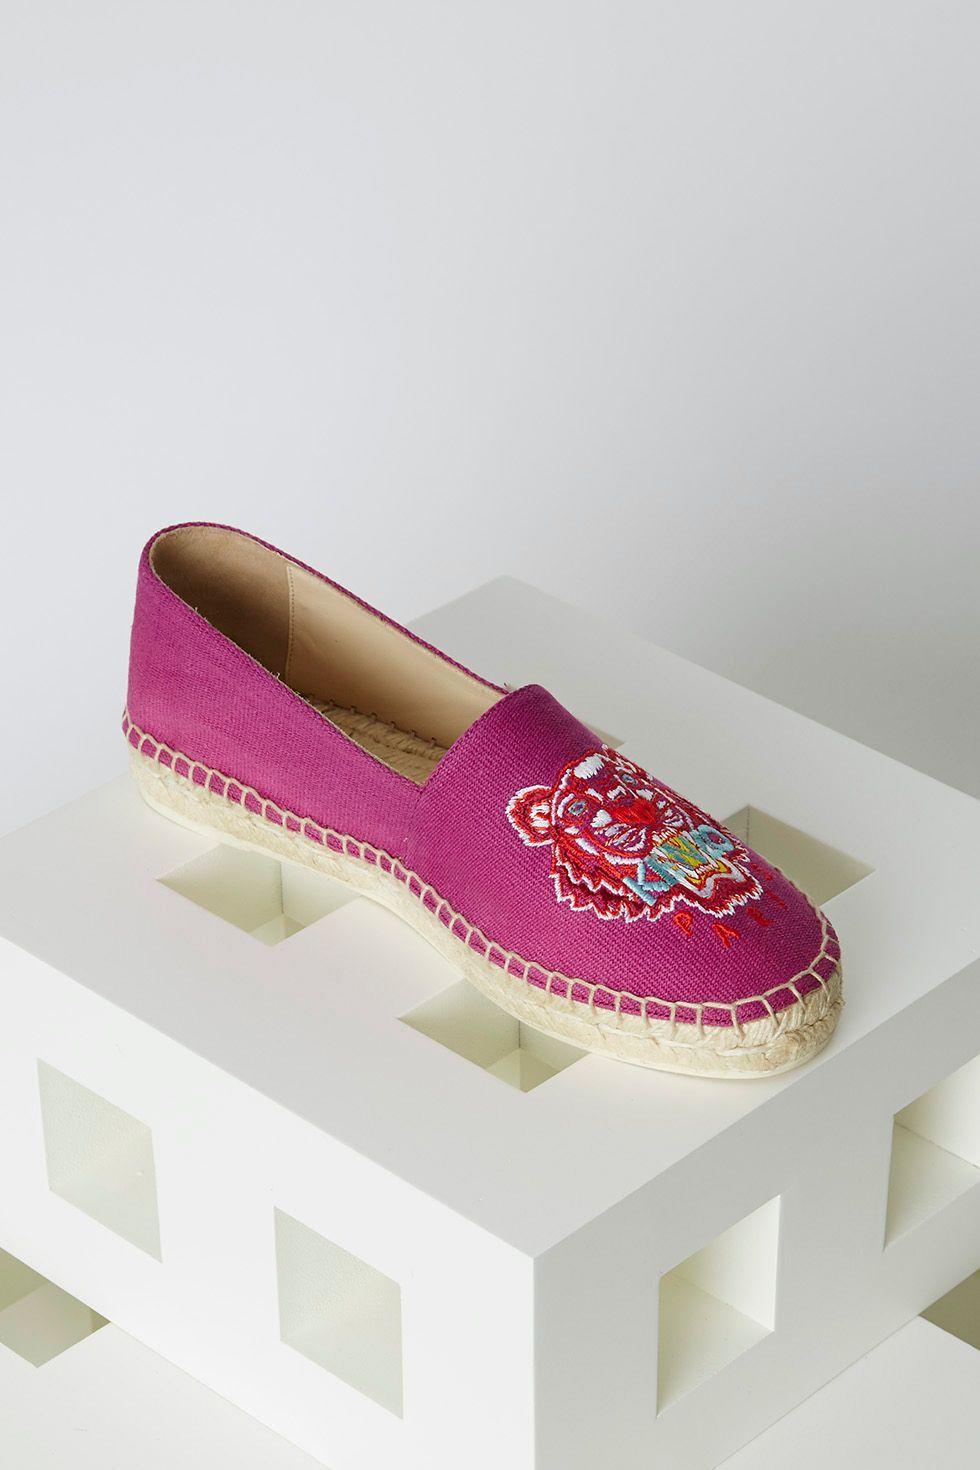 Kenzo Tiger Espadrilles - Kenzo Shoes Women - Kenzo E-shop  b68ebf26f